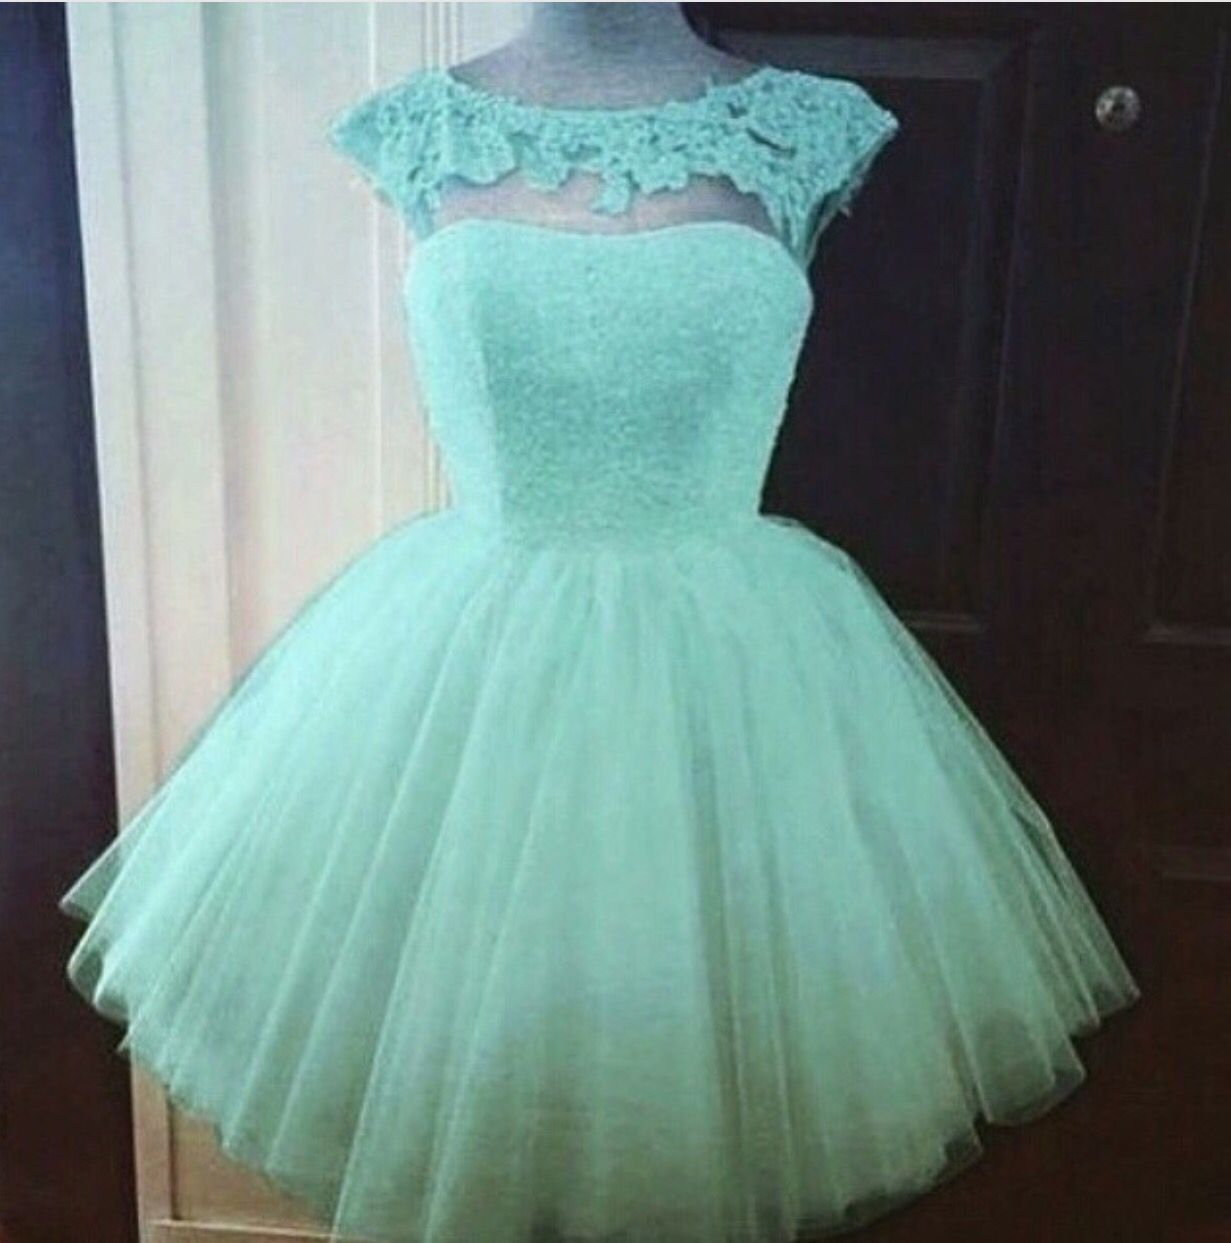 Vestido corto verde menta